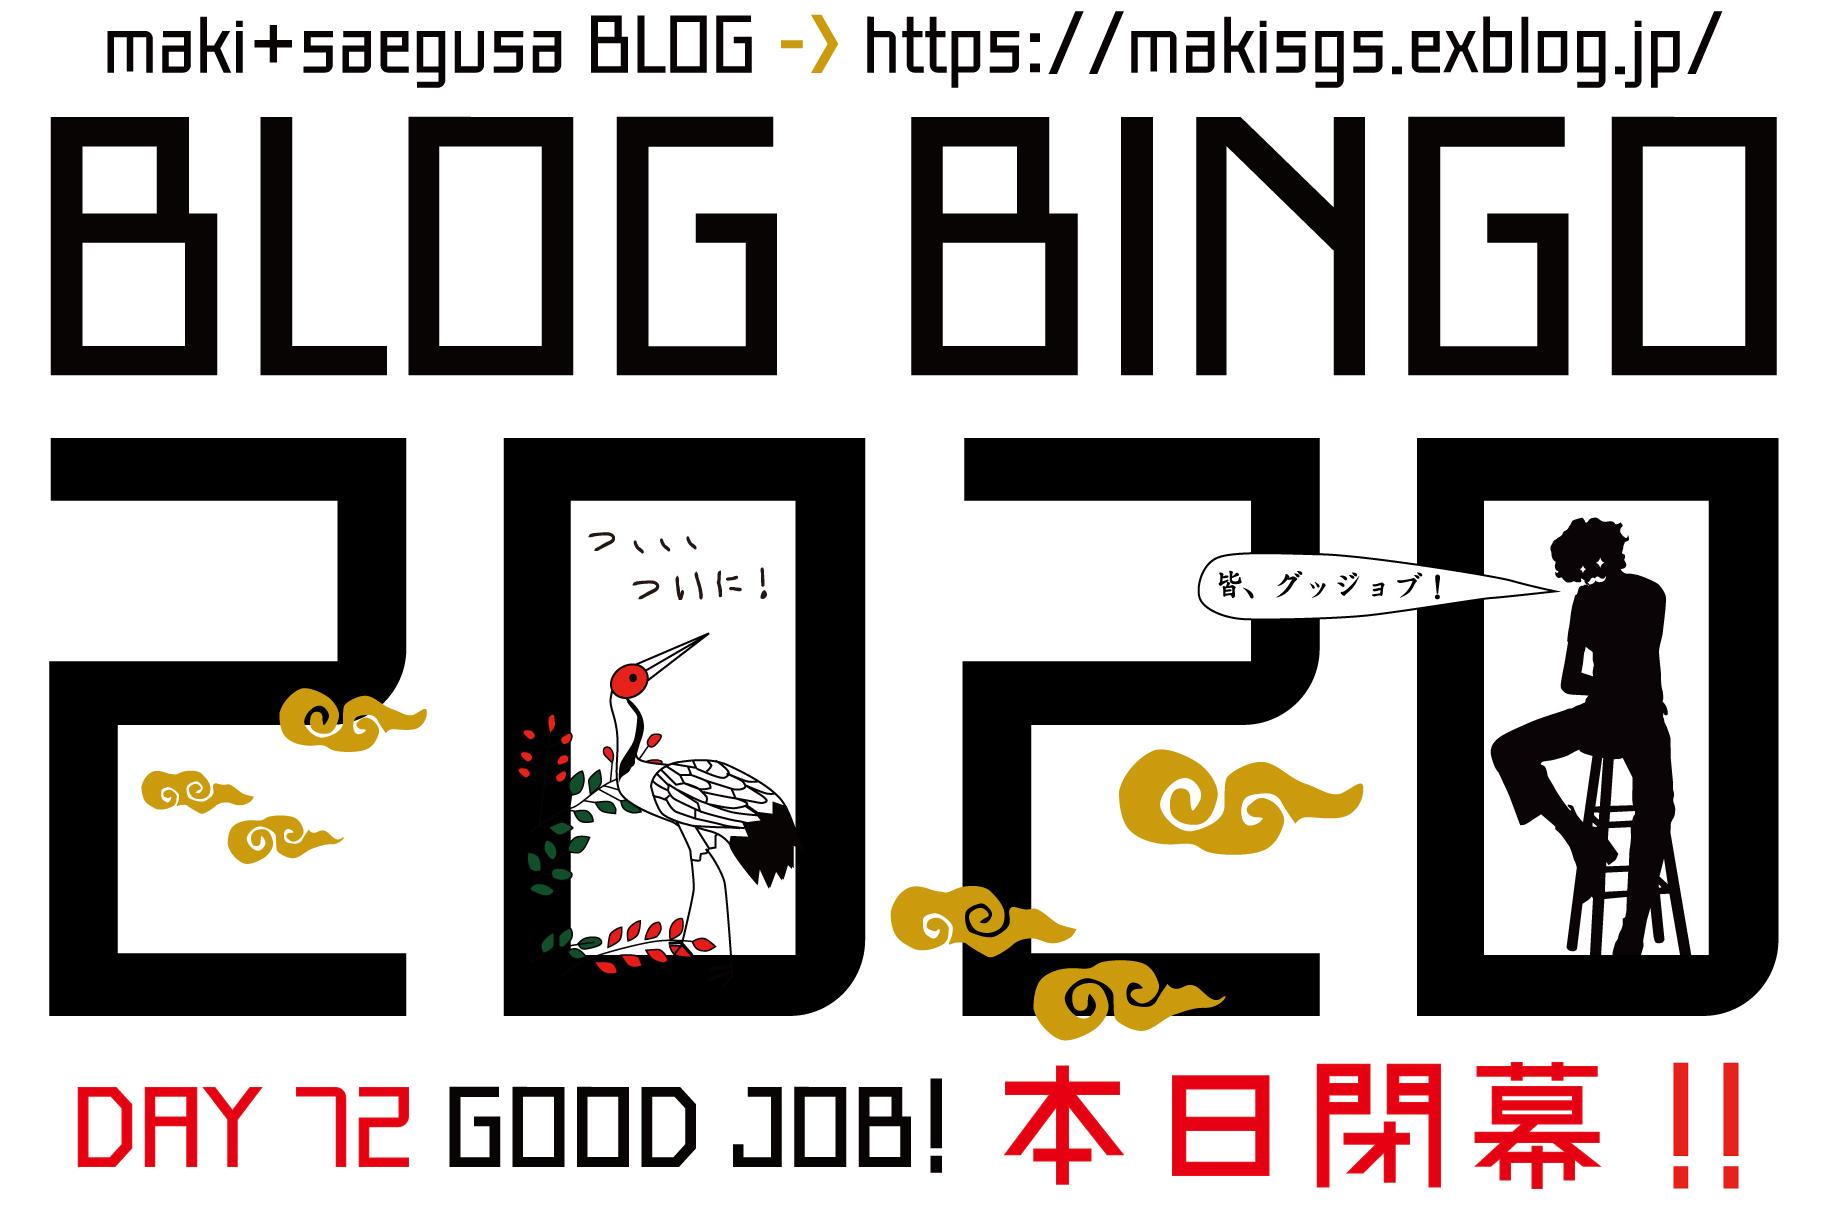 【BLOG BINGO 2020】DAY 72:とうとう・・・最終日!!!_d0018646_19363995.jpg